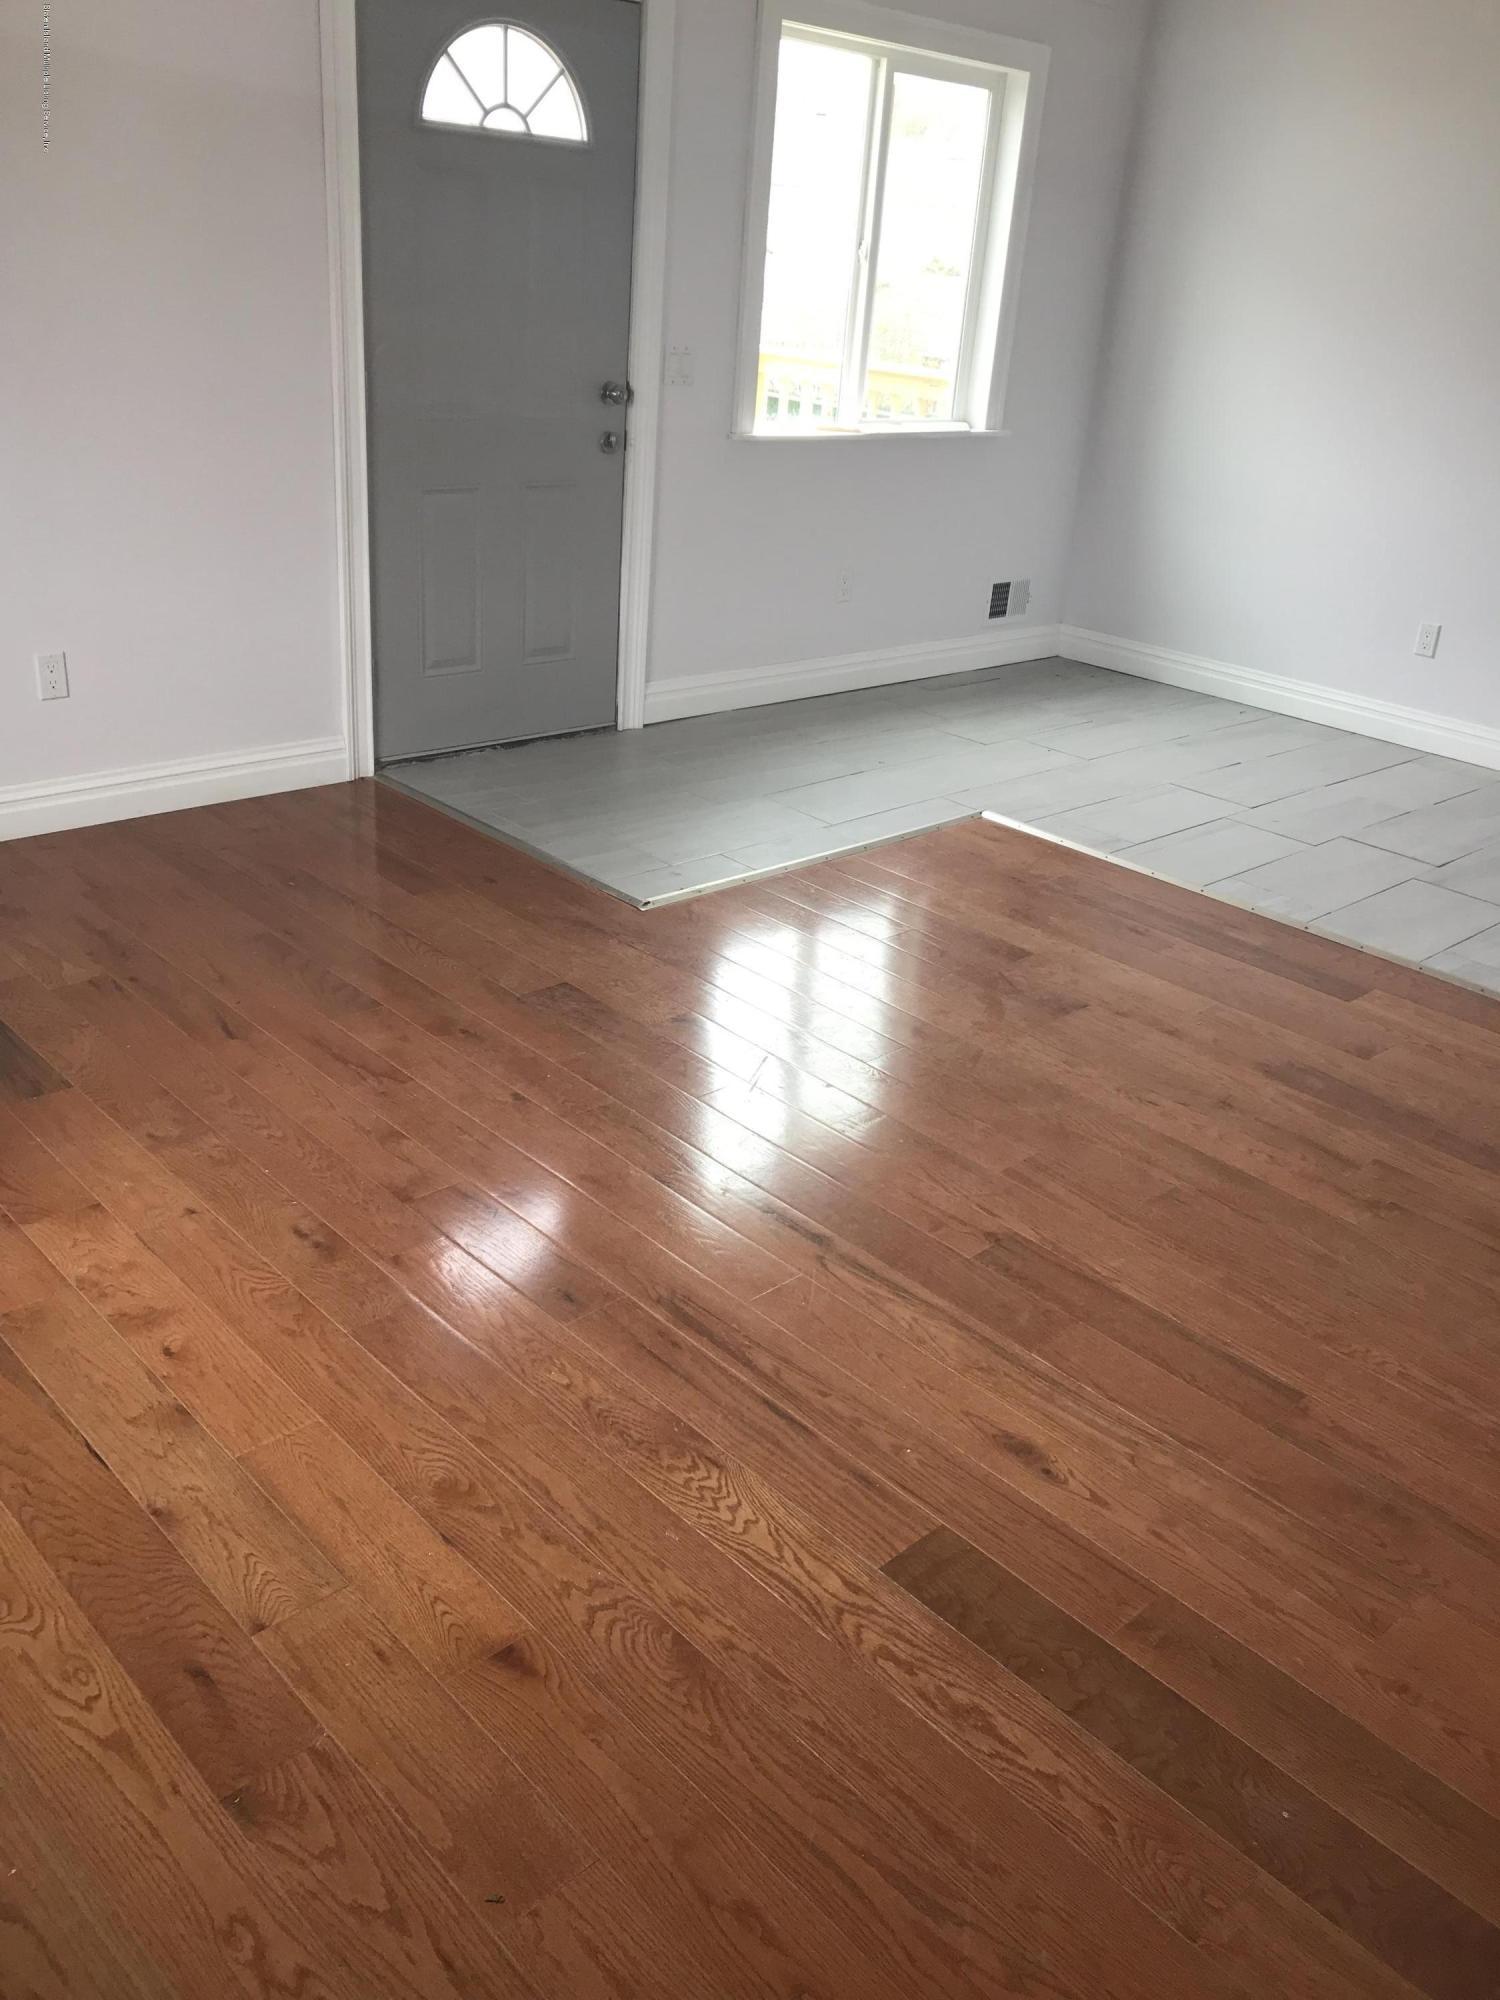 Two Family - Detached 120 Pemberton Avenue  Staten Island, NY 10308, MLS-1124929-15